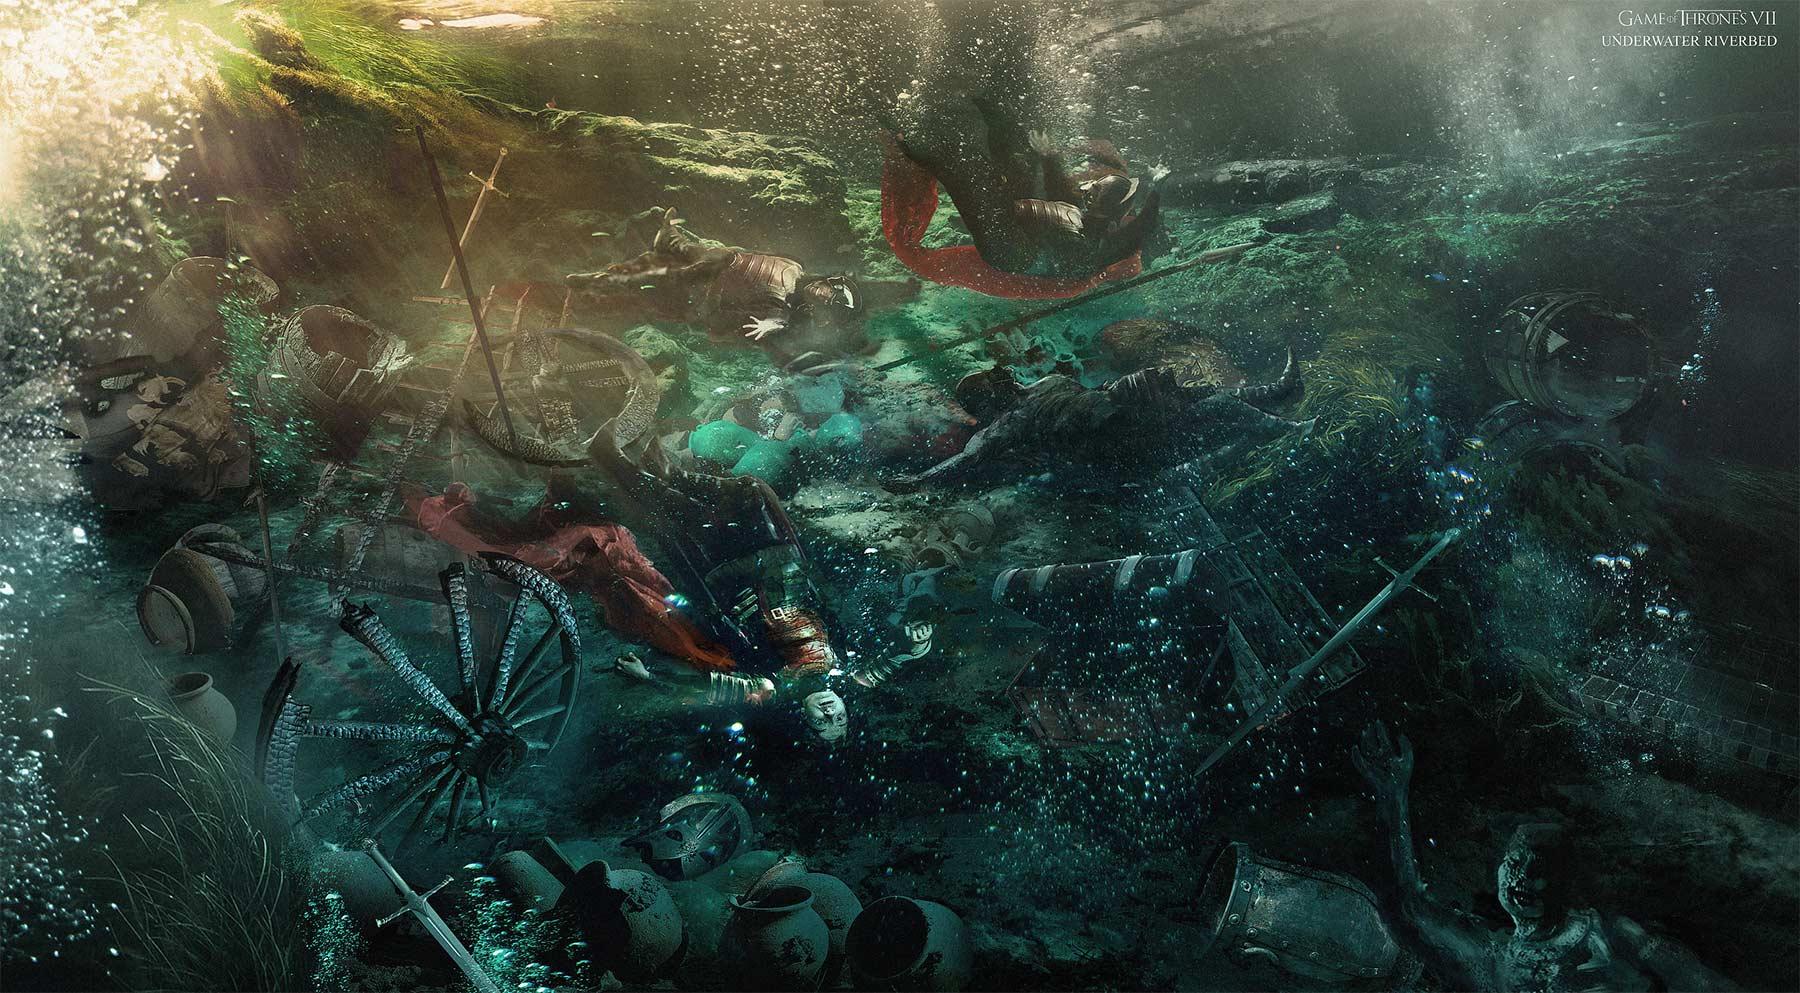 Game of Thrones Staffel 7 Concept Art Kieran-Belshaw-game-of-thrones-concept-art_17